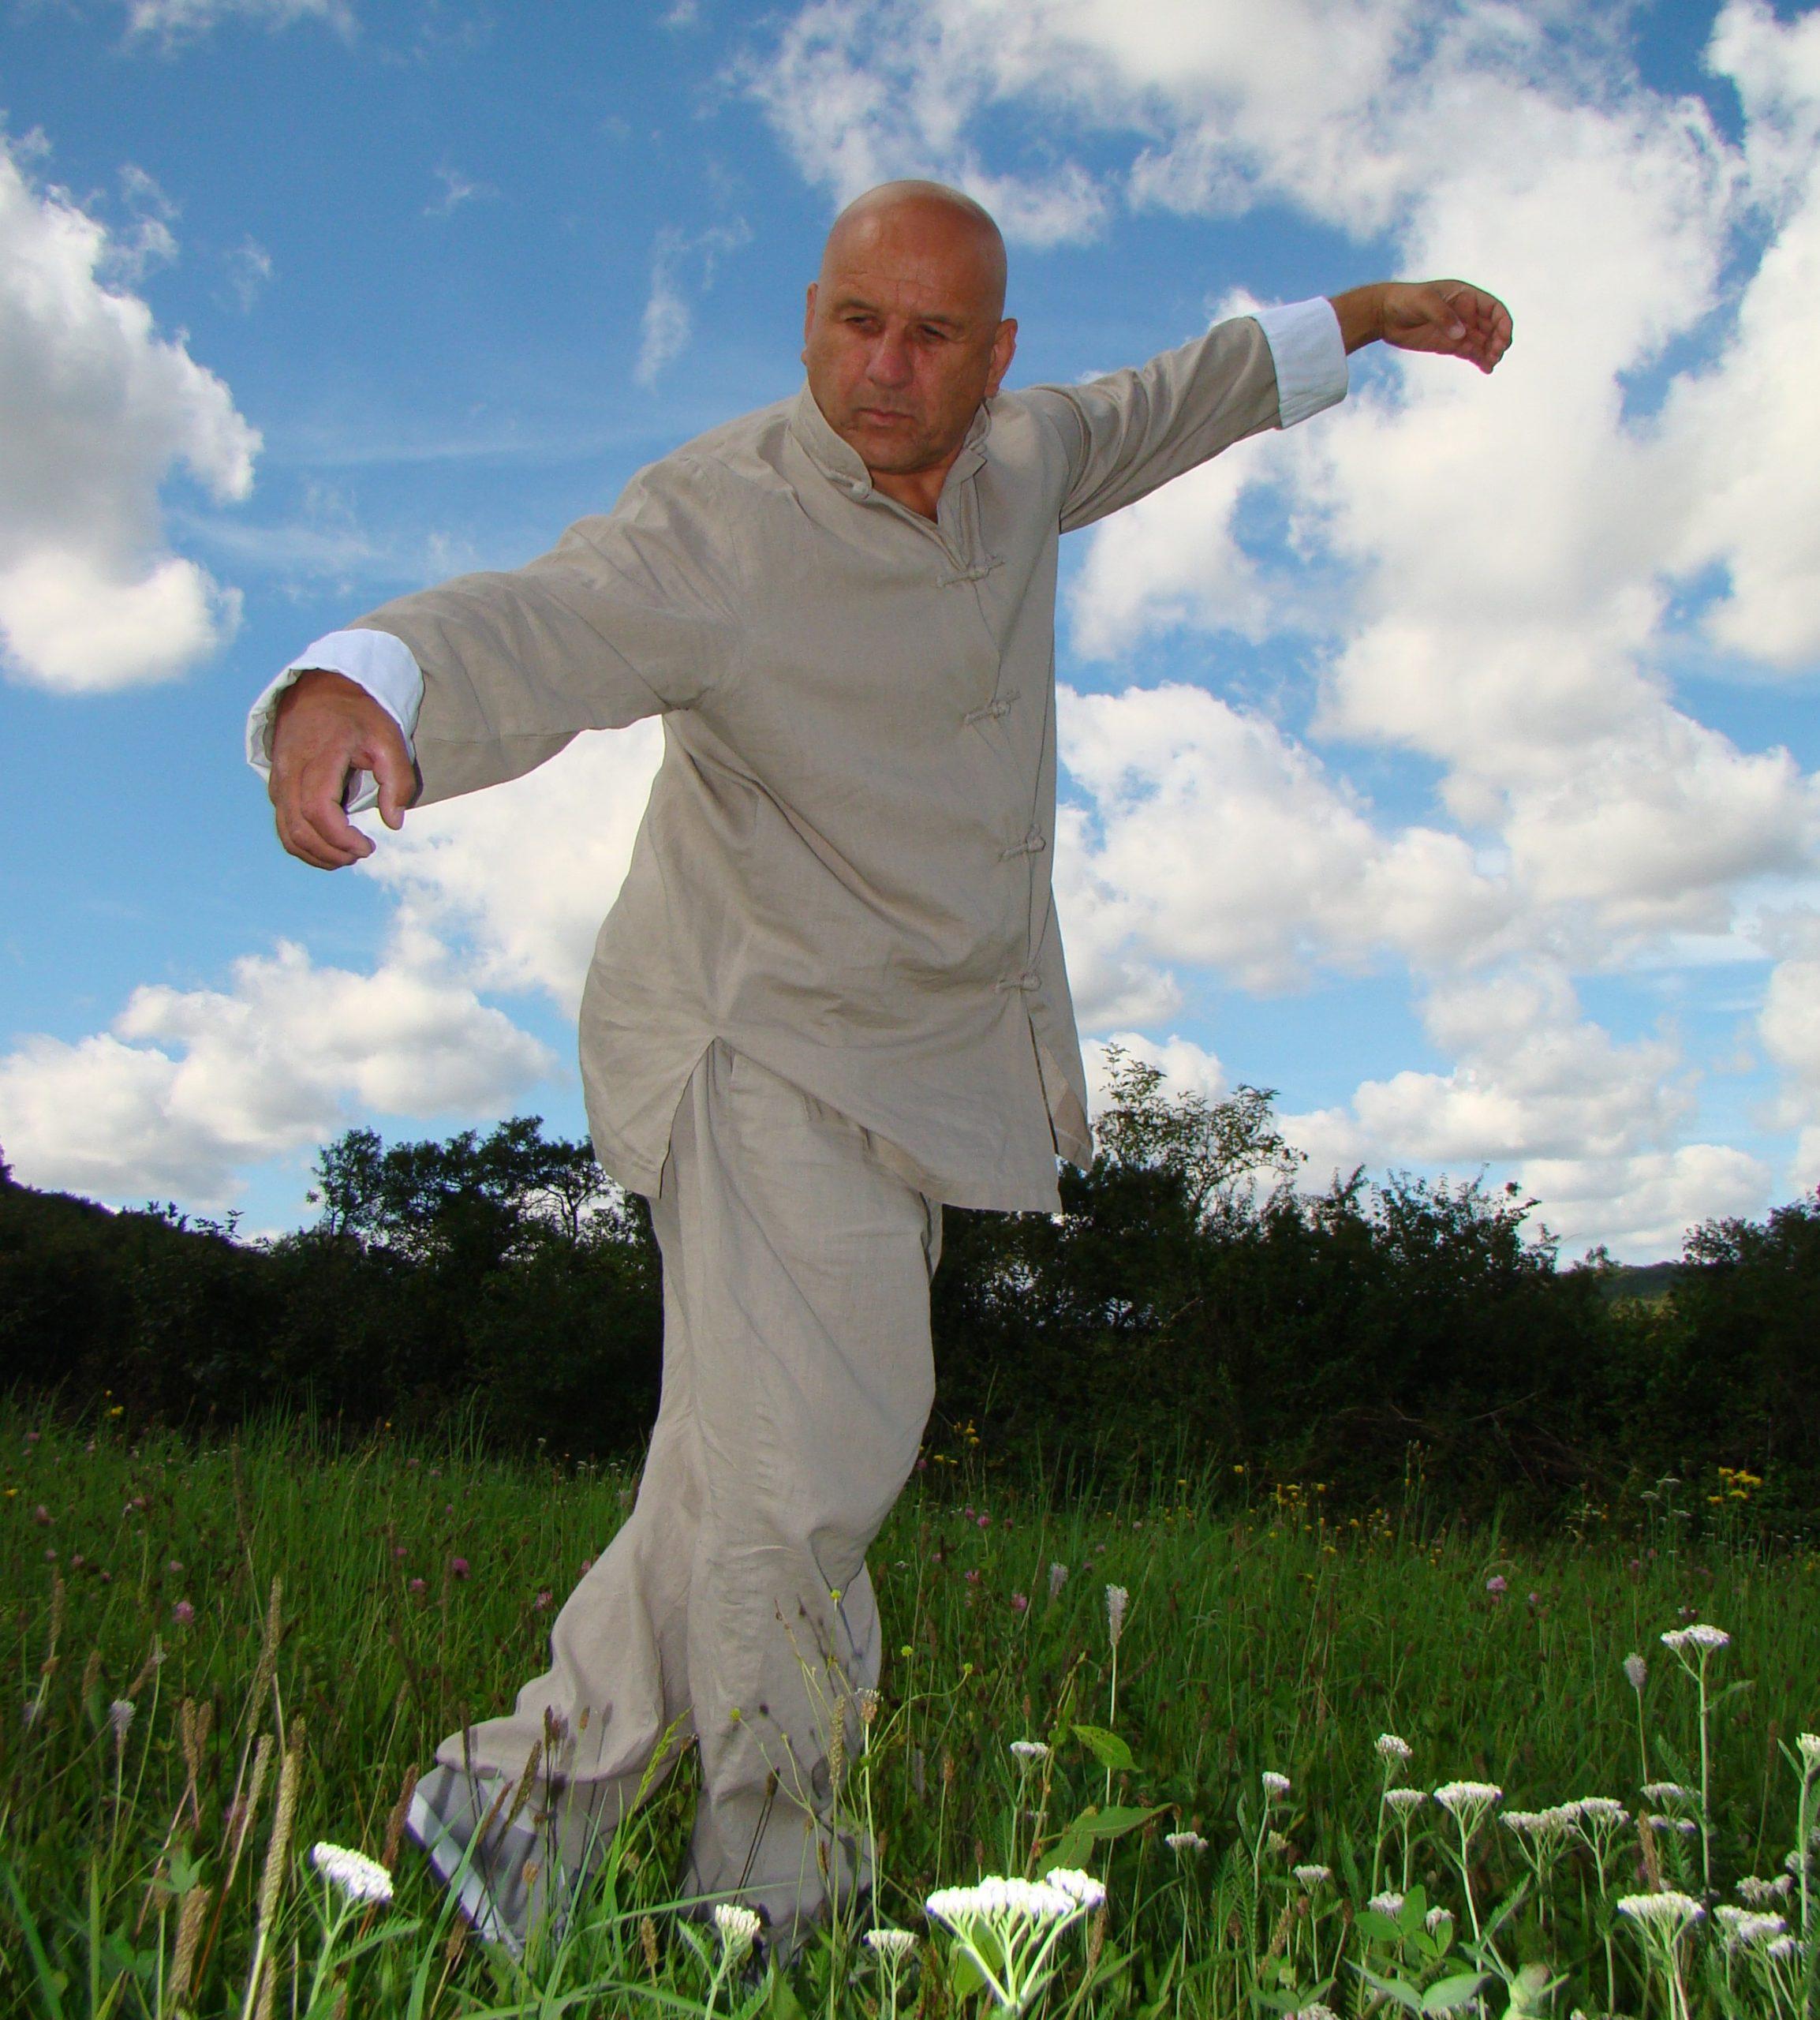 Qigong-Kurs: Prävention – Heilung – Spiritualität